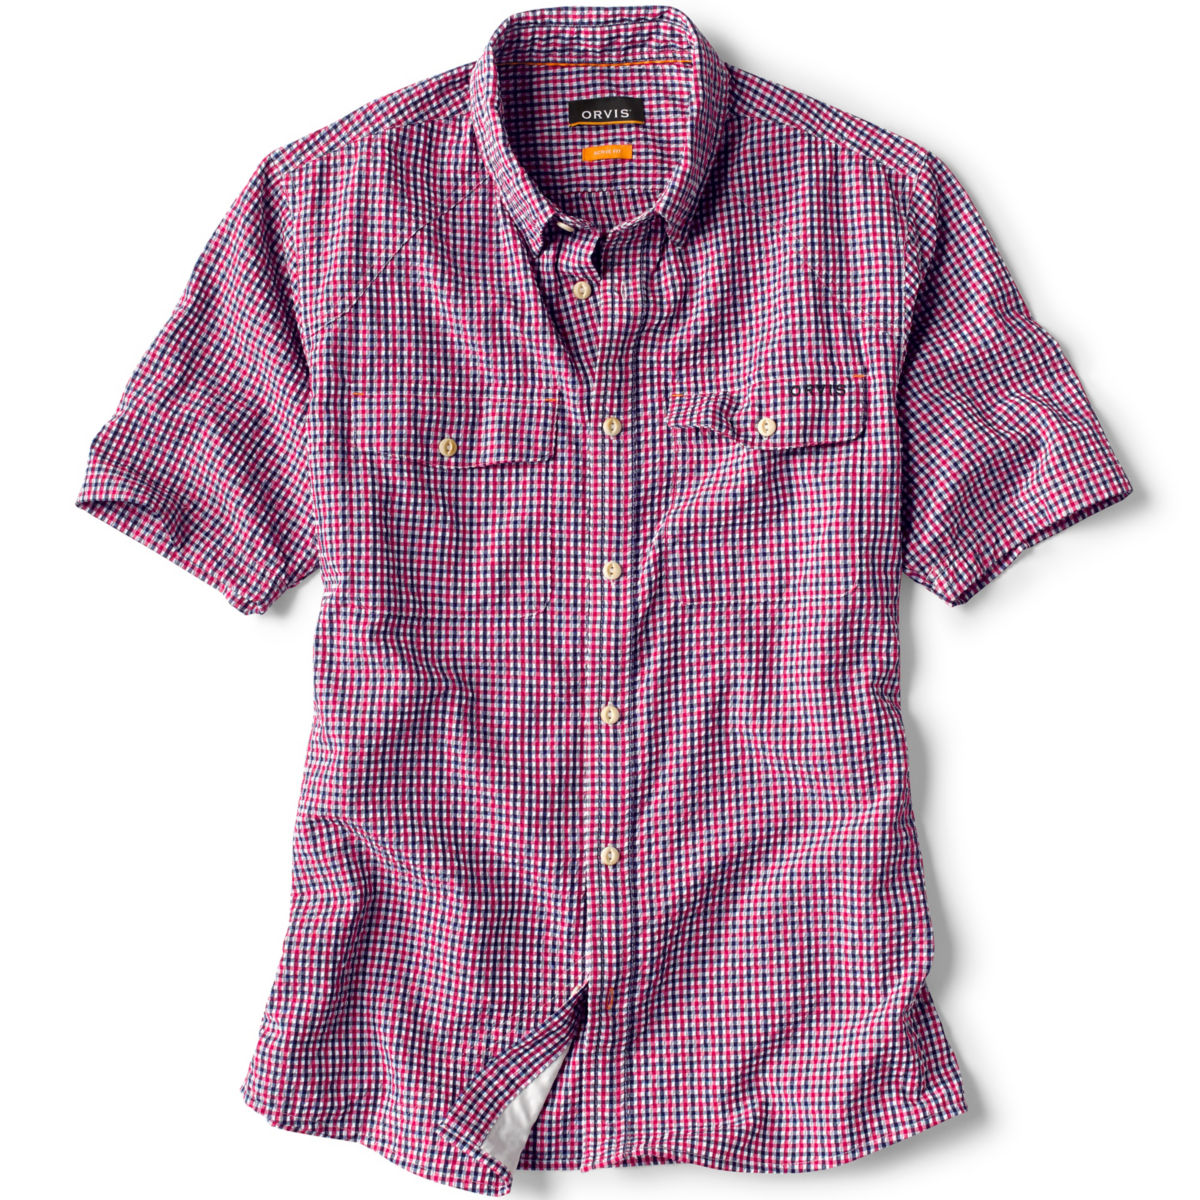 Clearwater Seersucker Short-Sleeved Shirt - RED/WHITE/BLUEimage number 0